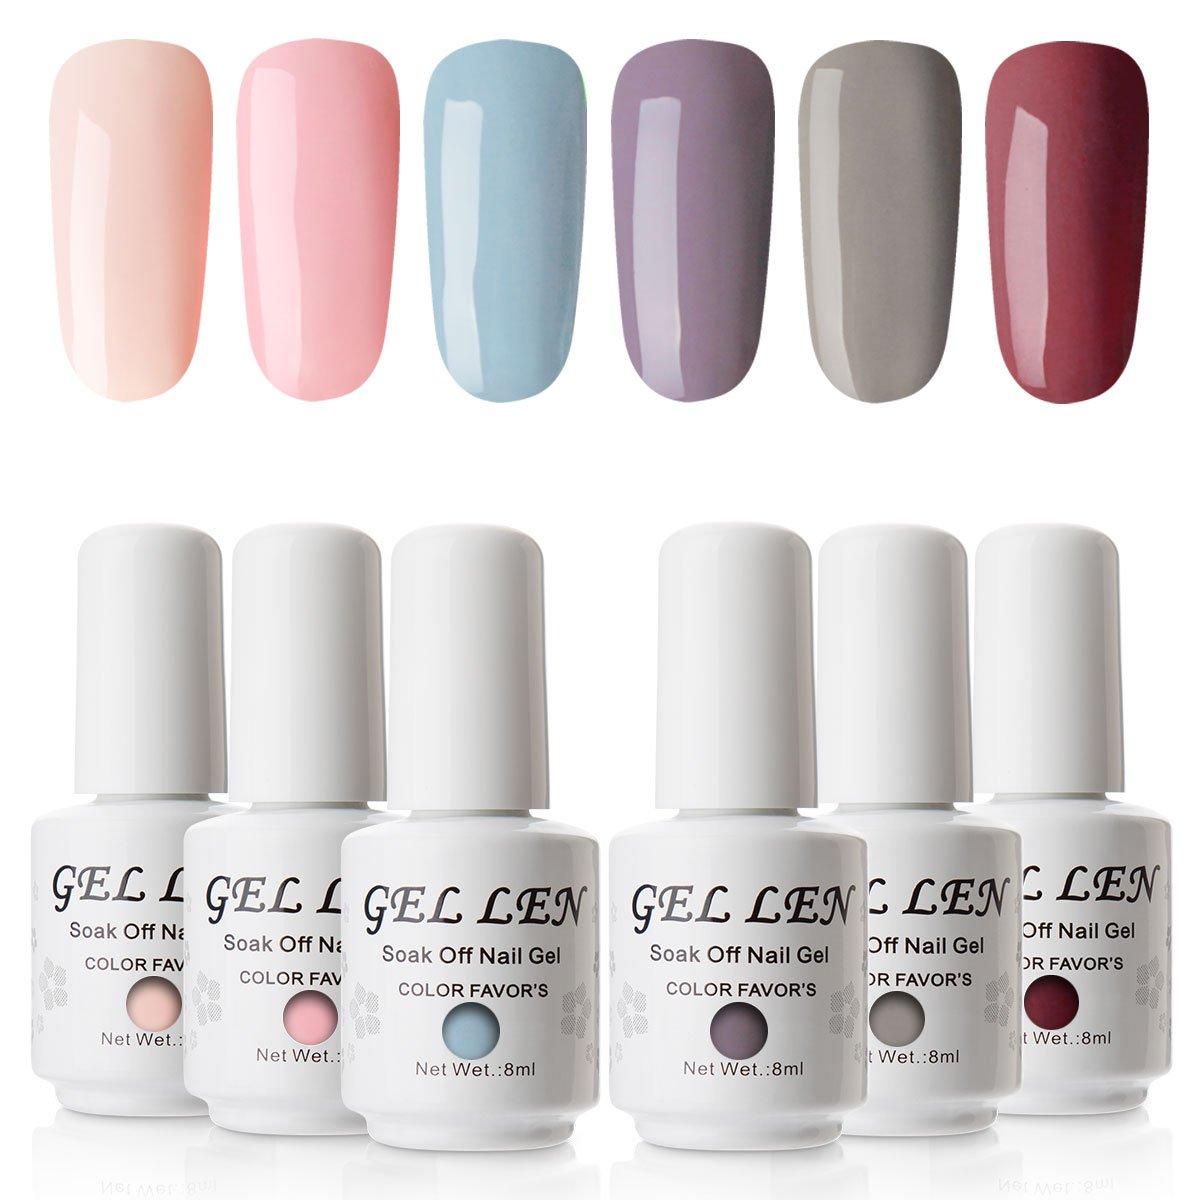 Gellen Nude Colour Gel Polish Kit - 8ml 6 Colours Gel Nail Polish UV LED Soak off Manicure Gel Lacquer Set Ltd.